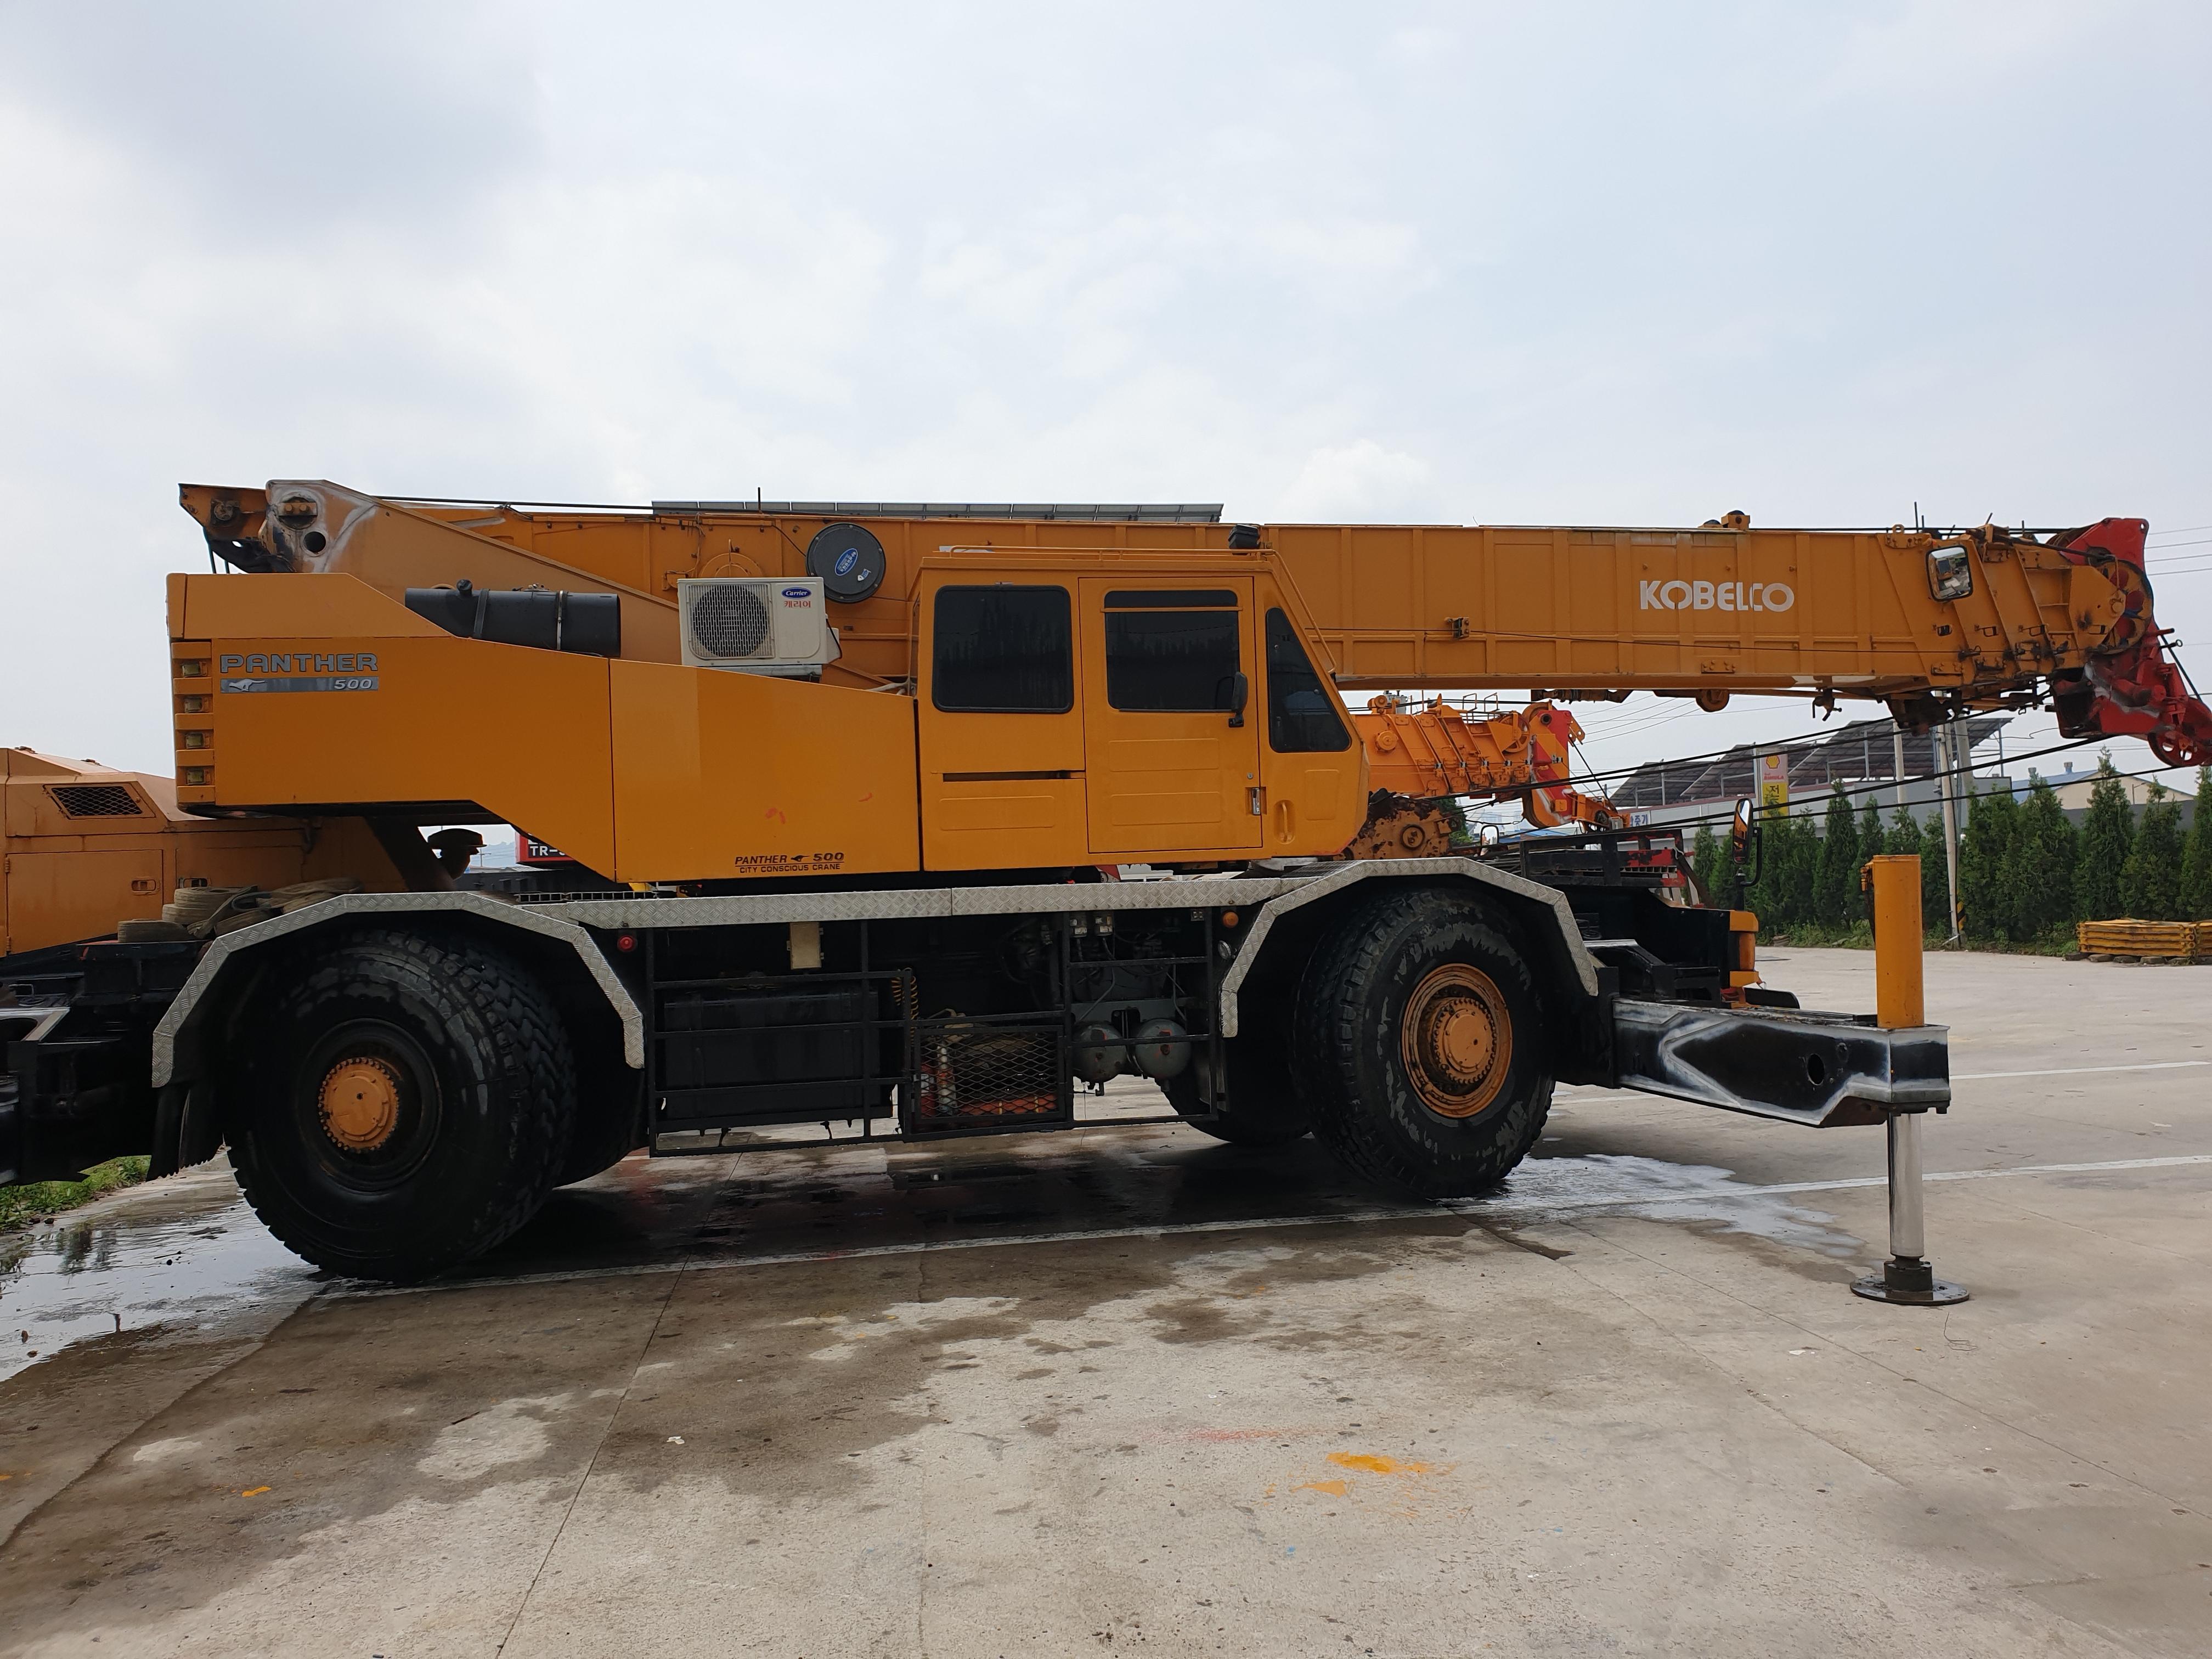 Crane Rough Terrain, RT crane, 45ton, KOBELCO, RK450, Model-Panther500, 1990year,  working condition,    smgyo@naver.com,        중고 험지형 크레인 매매 수출,  중고 맹꽁이 크레인 수출문의 매매문의,   코벨코,  45톤,  RK450..